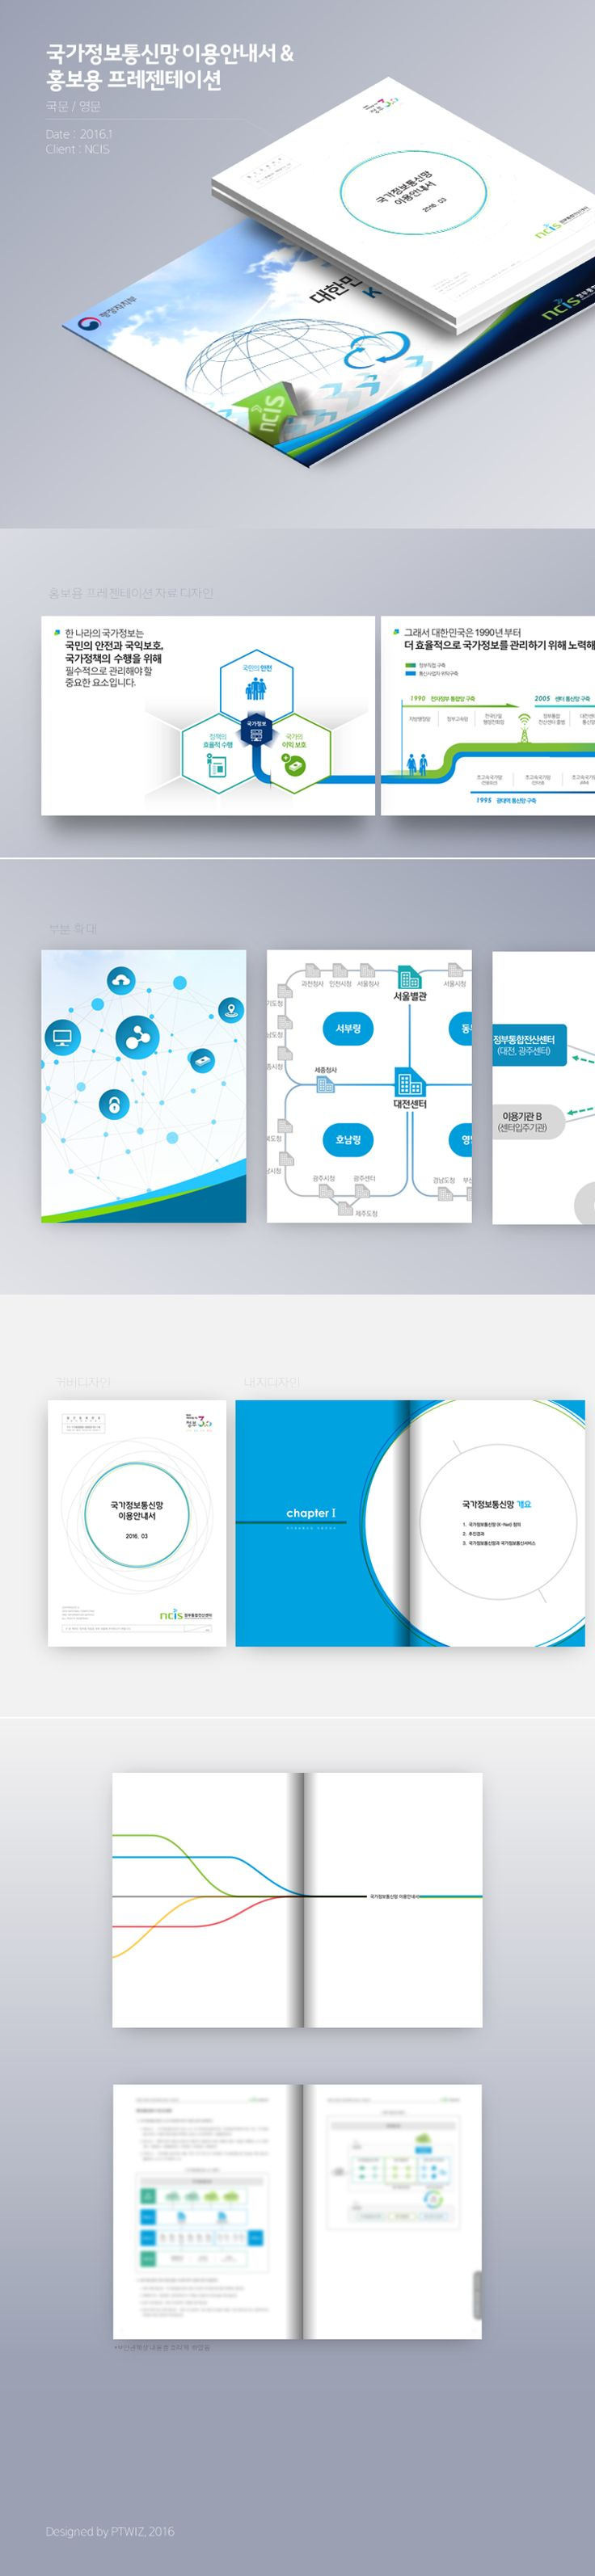 Brochure Design, by ptwiz 2016